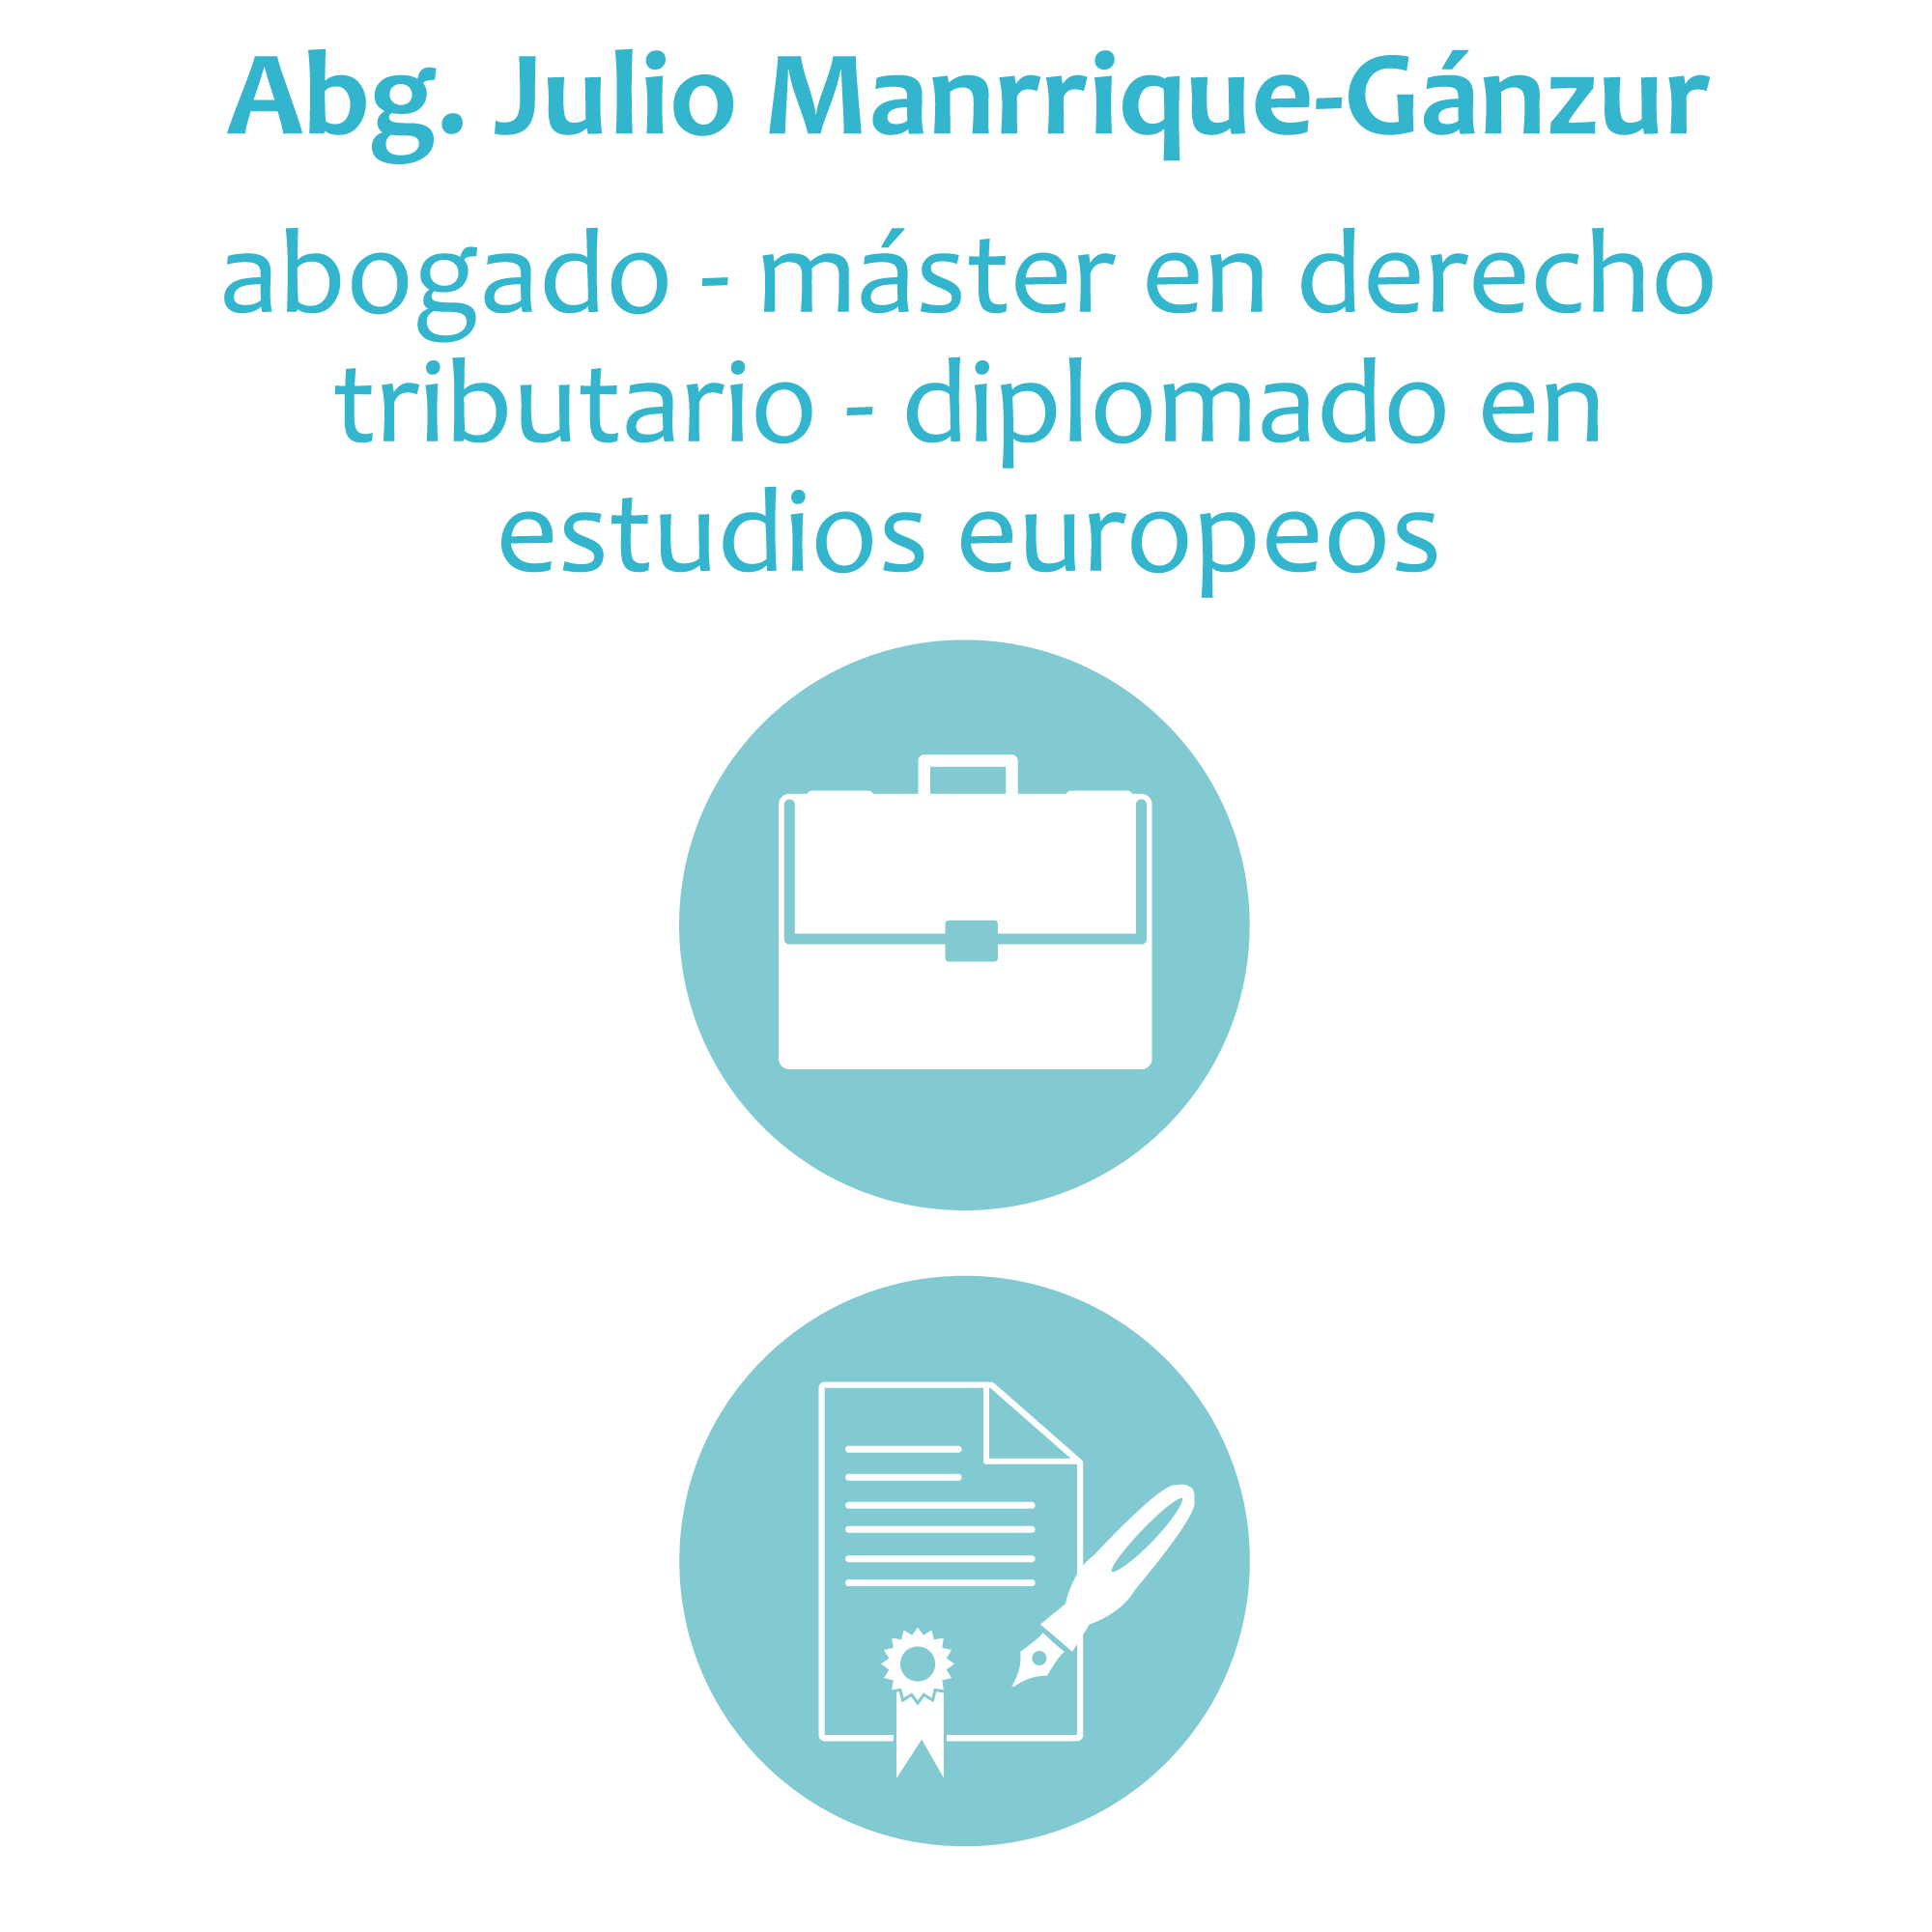 Abg. Julio Manriquez-Ganzur A.